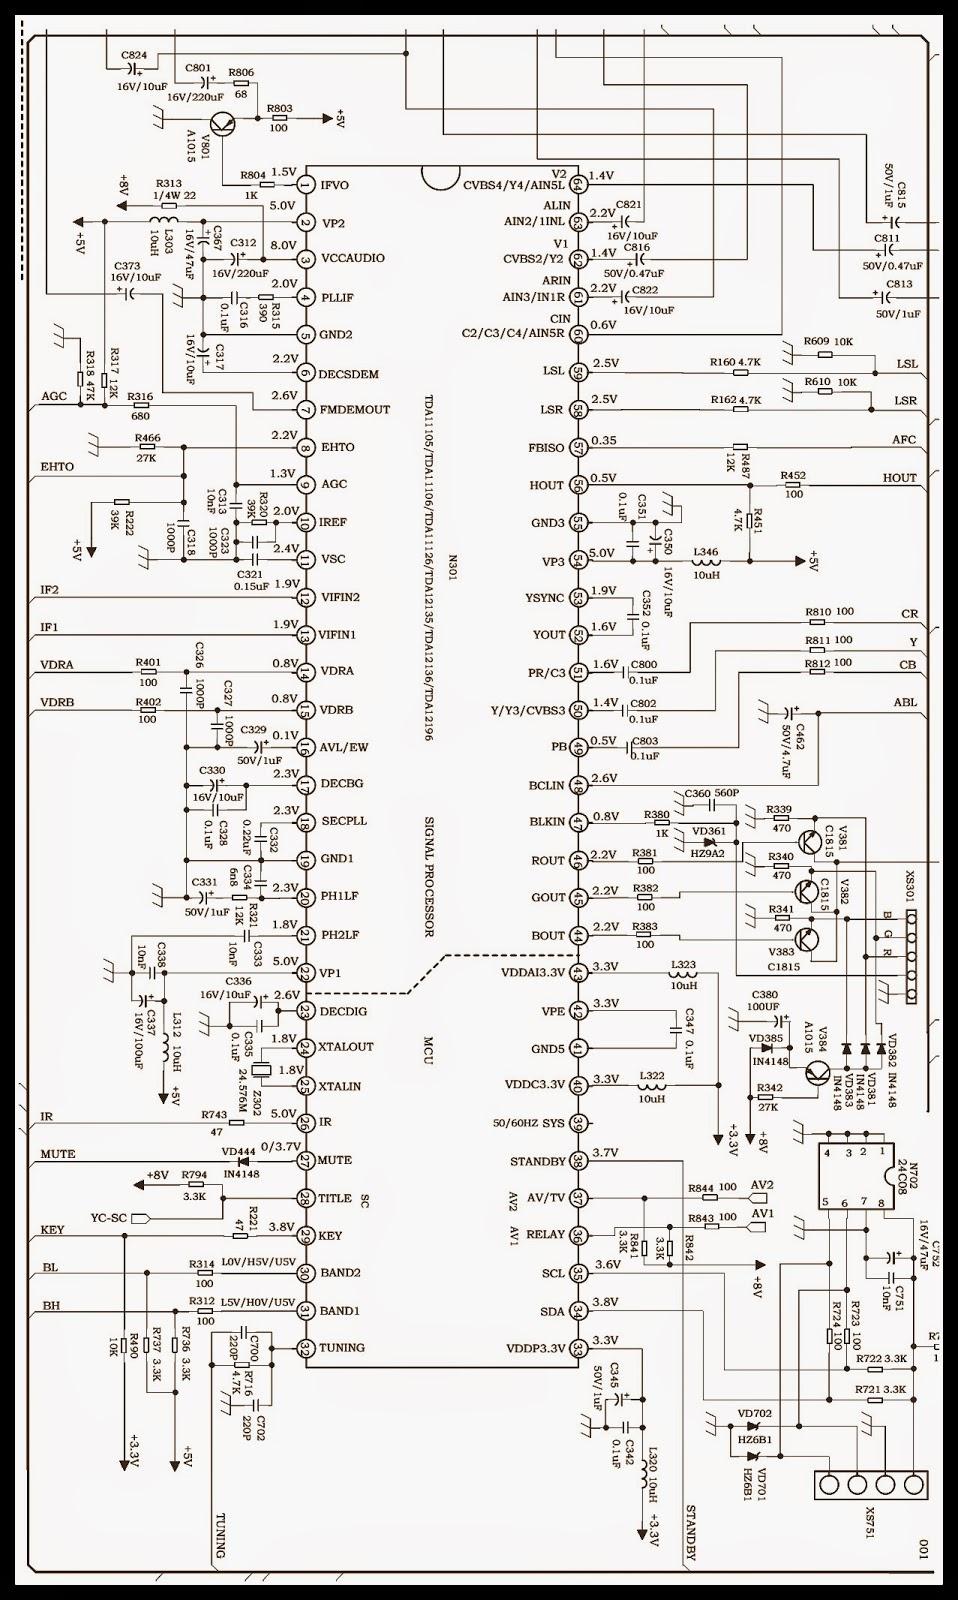 str w6553a smps schematic tda11106 schematic pin voltages